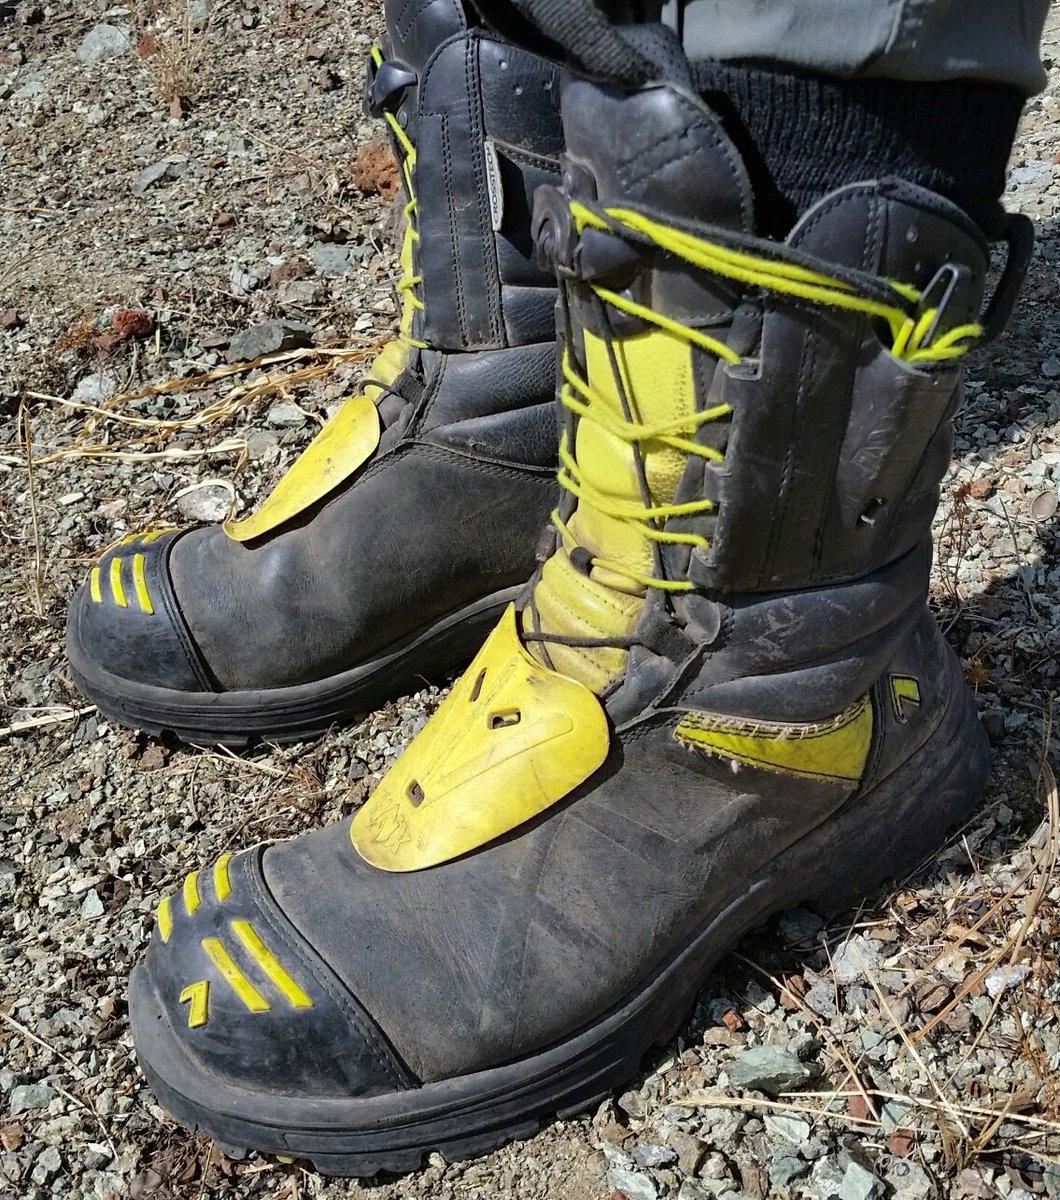 Cum On My Fireman Boots